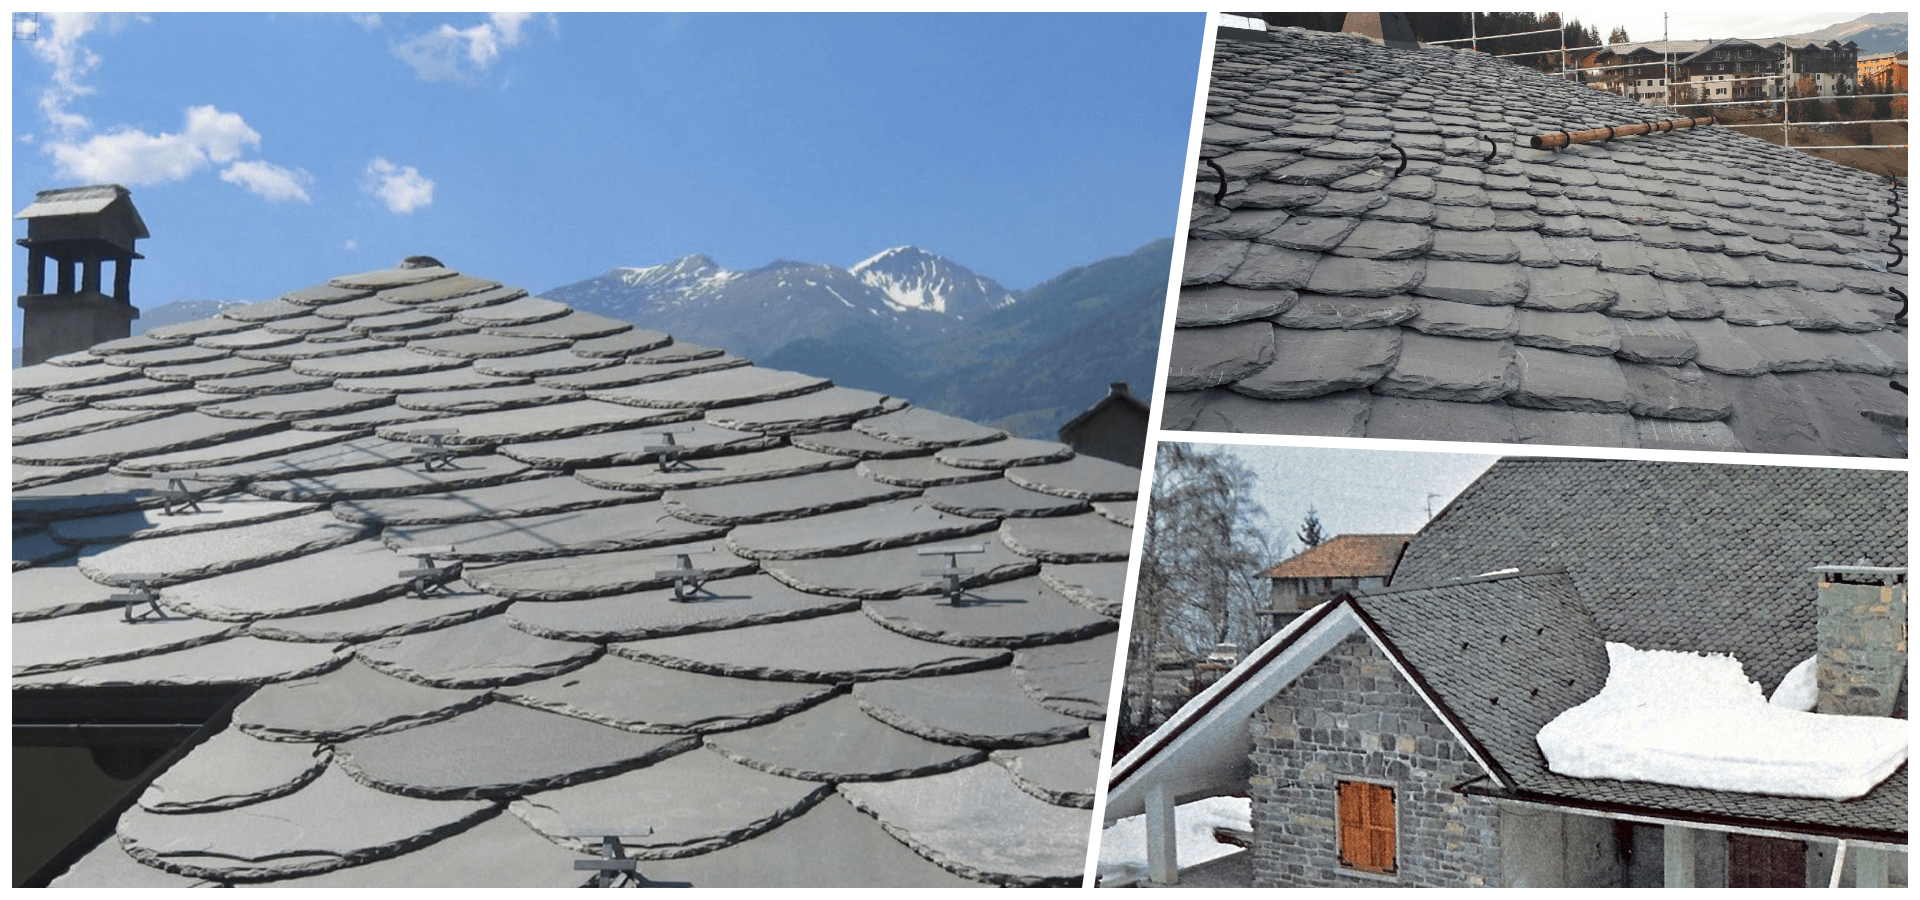 Roofing Stone Tiles Manufacturer Supplier Exporter of India - Rachana Stones